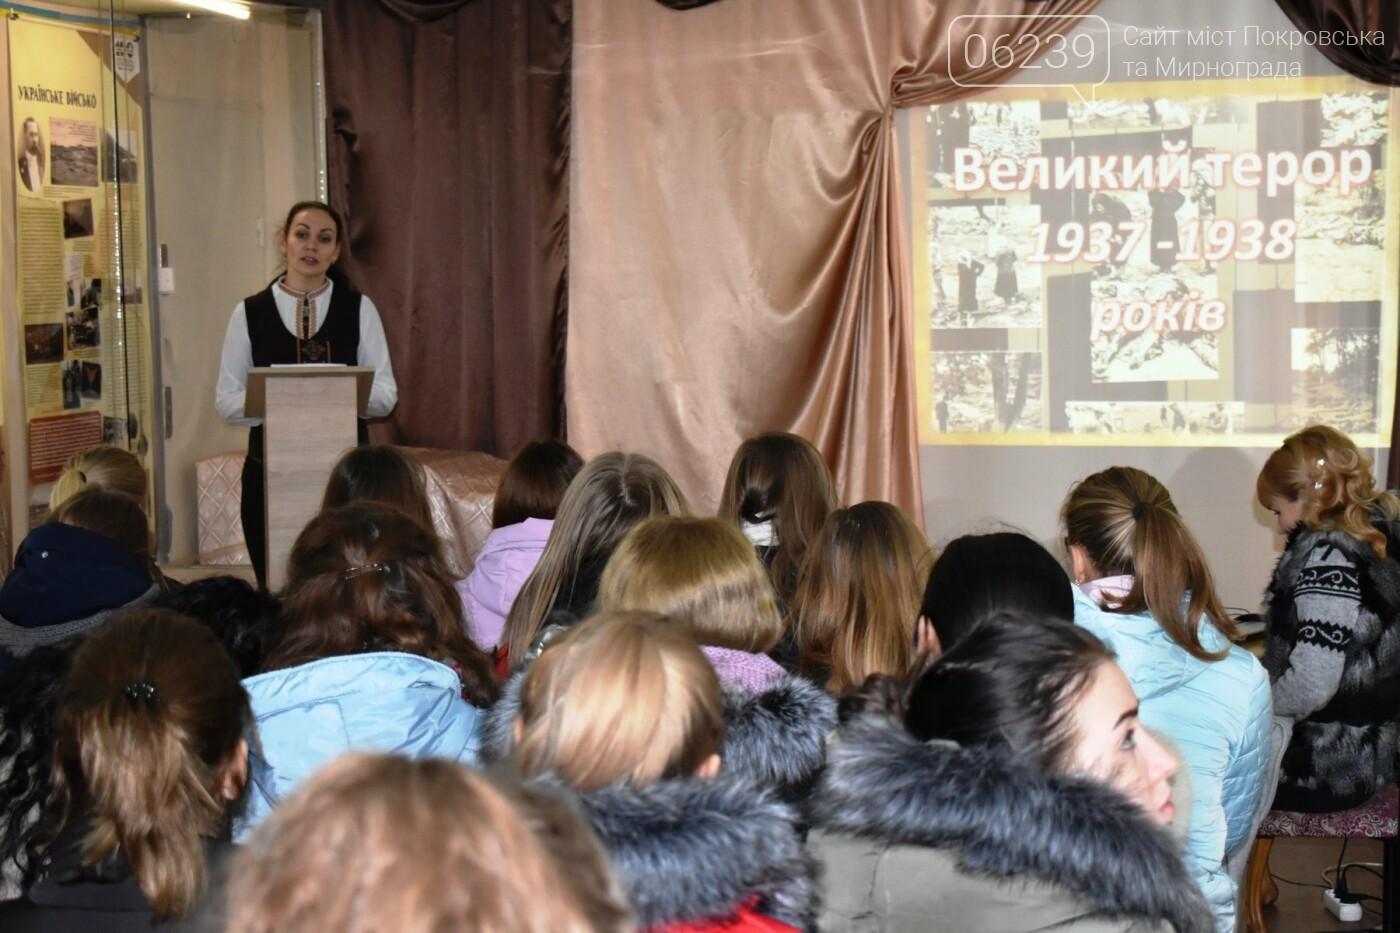 У Покровську вшанували пам'ять жертв «Великого терору», фото-2